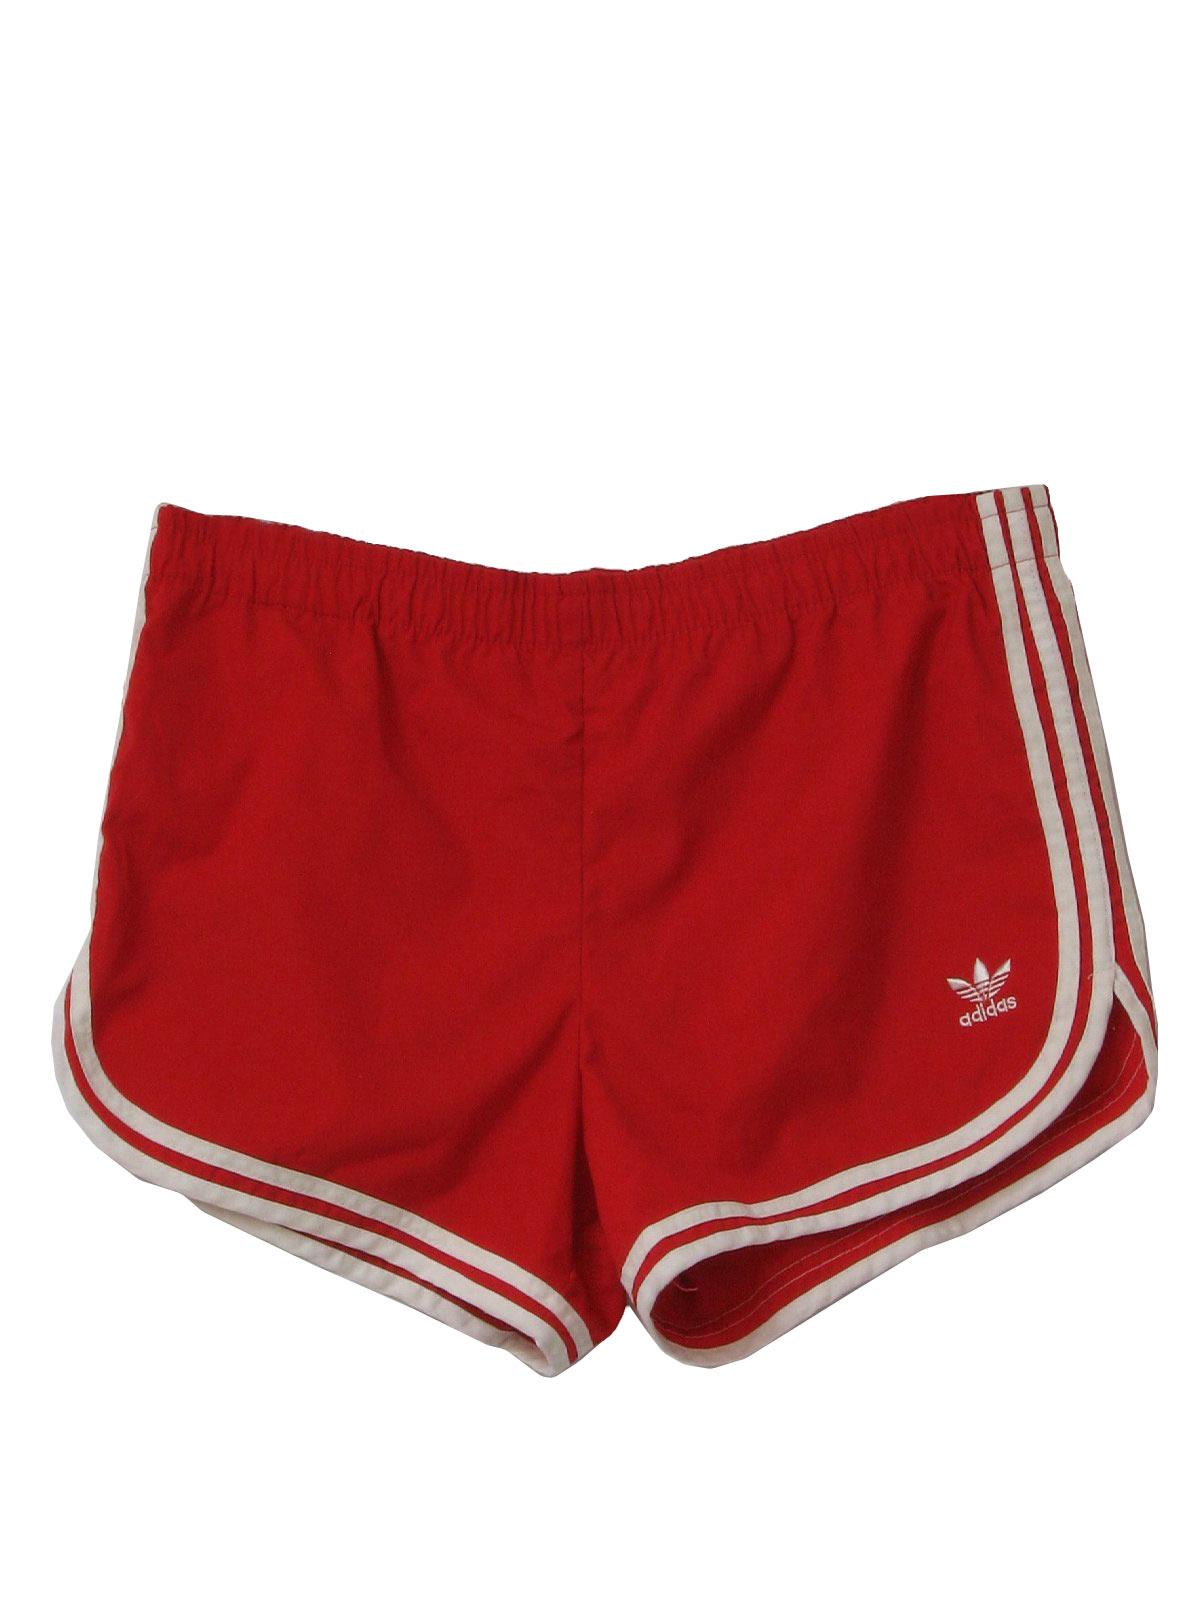 Totally Mens Adidas Shorts 1980's 80s byvmgI6fY7